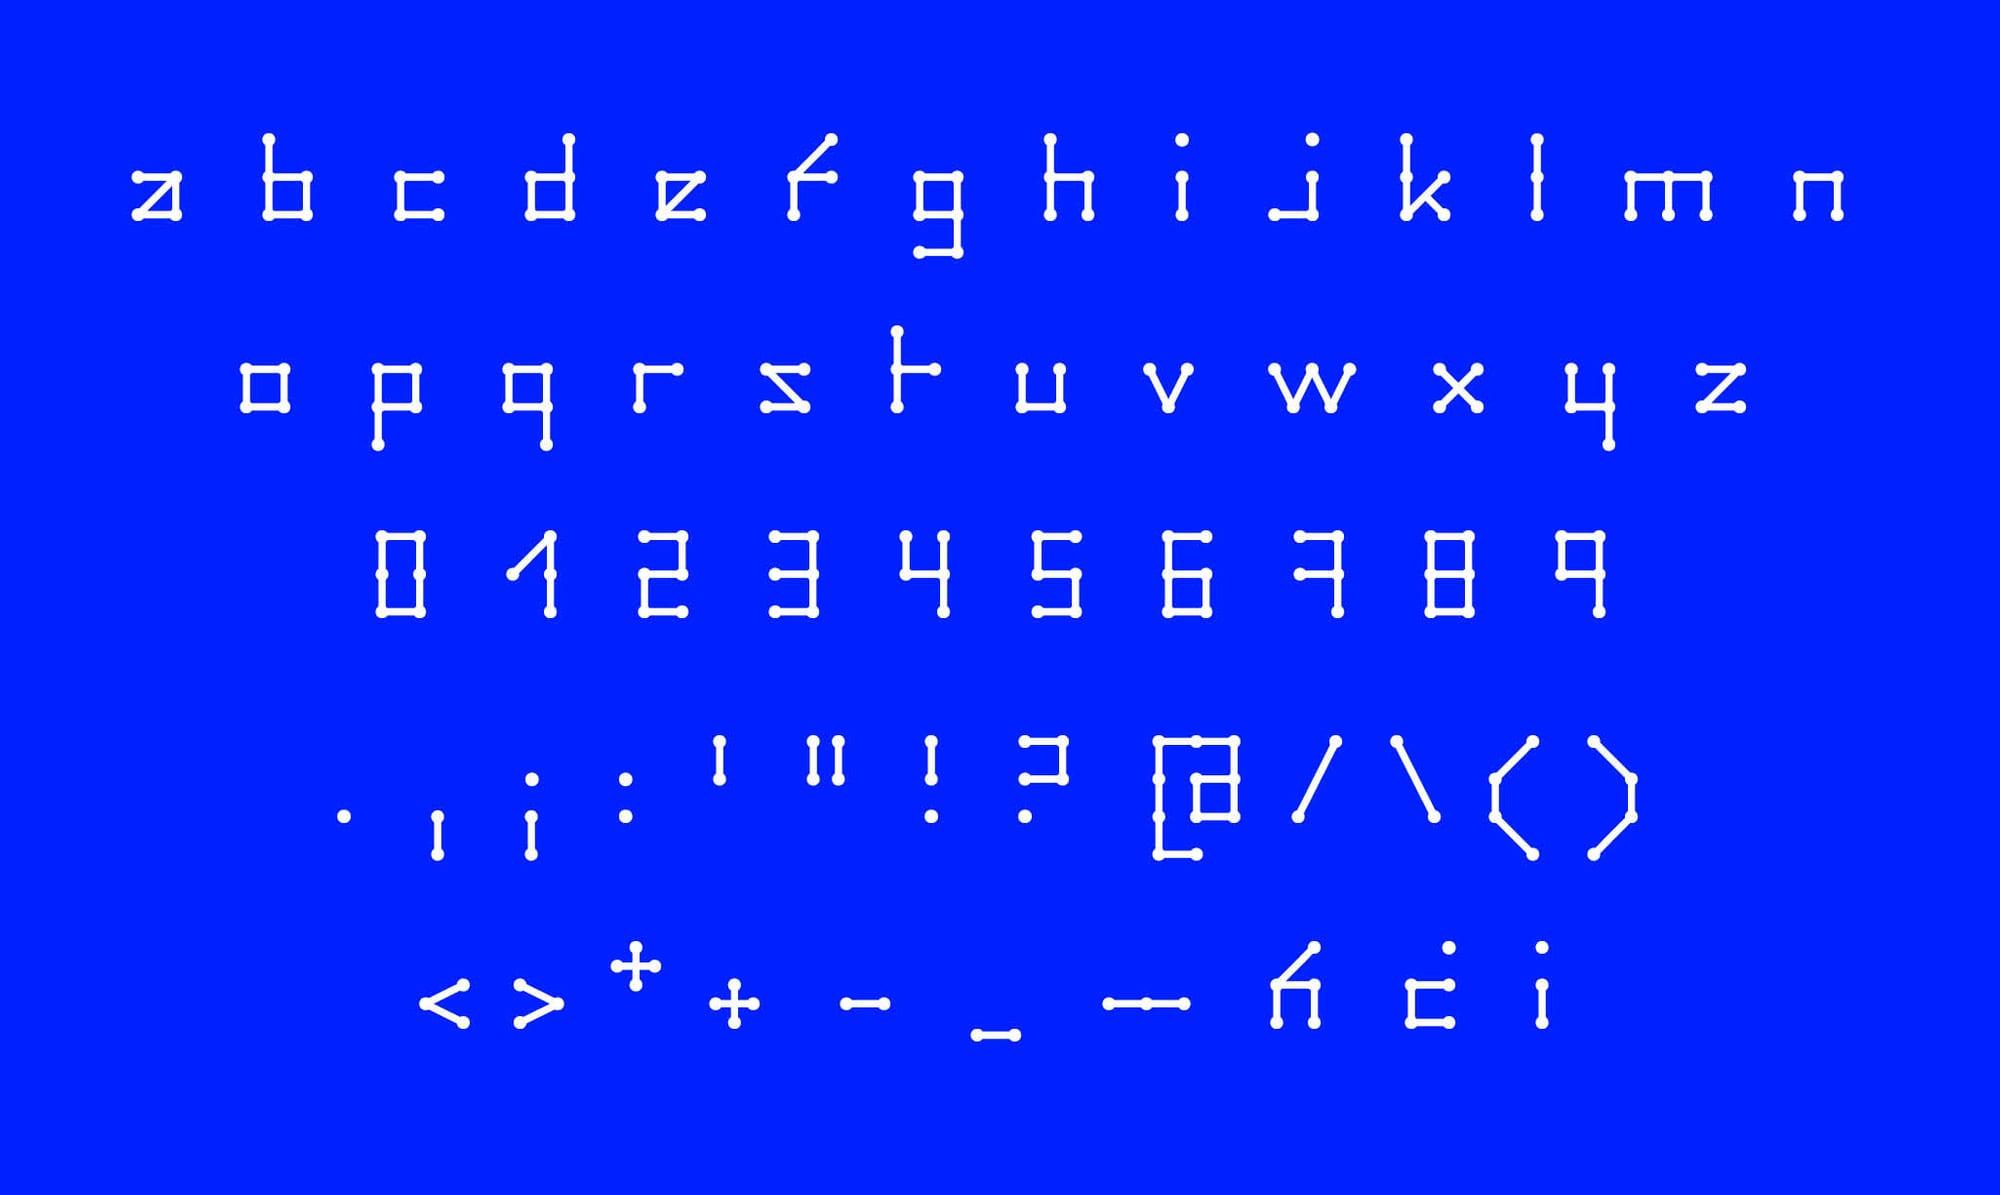 Josh-Carlisle,-2020,-PG-Cert-Design-for-Visual-Communication,-London-College-of-Communication,-UAL.jpg